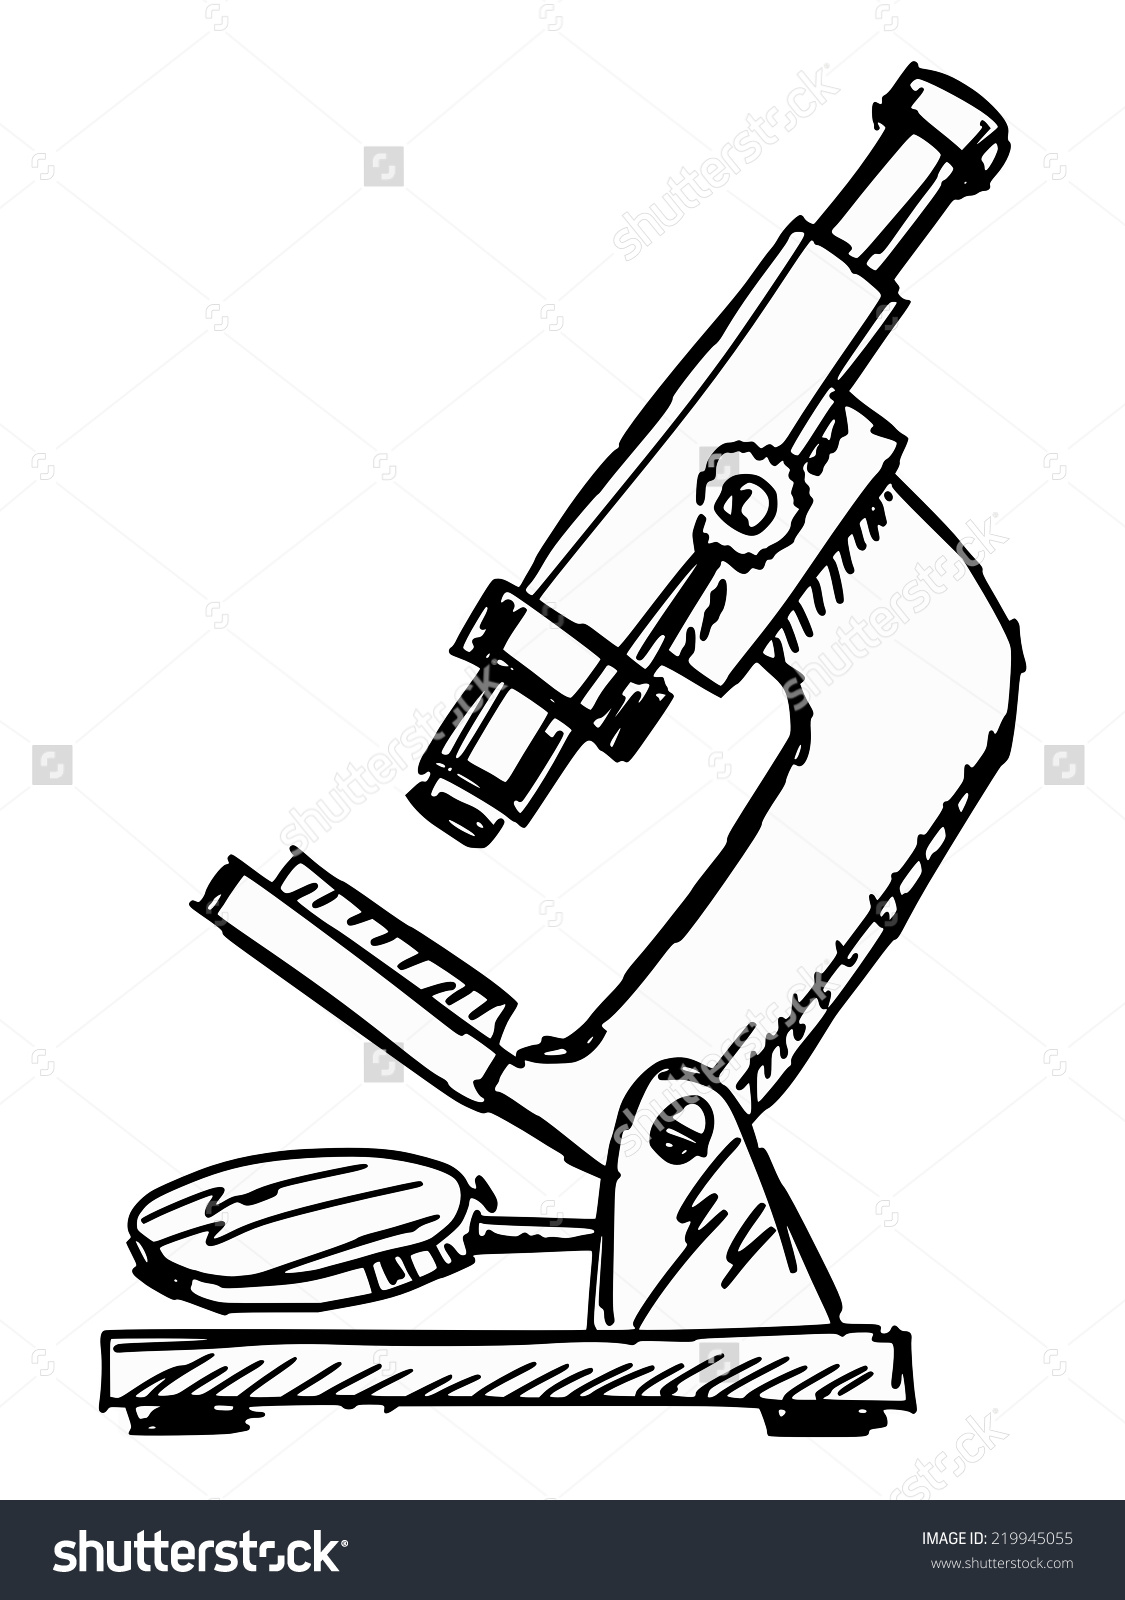 Hand Drawn Sketch Illustration Microscope Stock Vector 219945055.